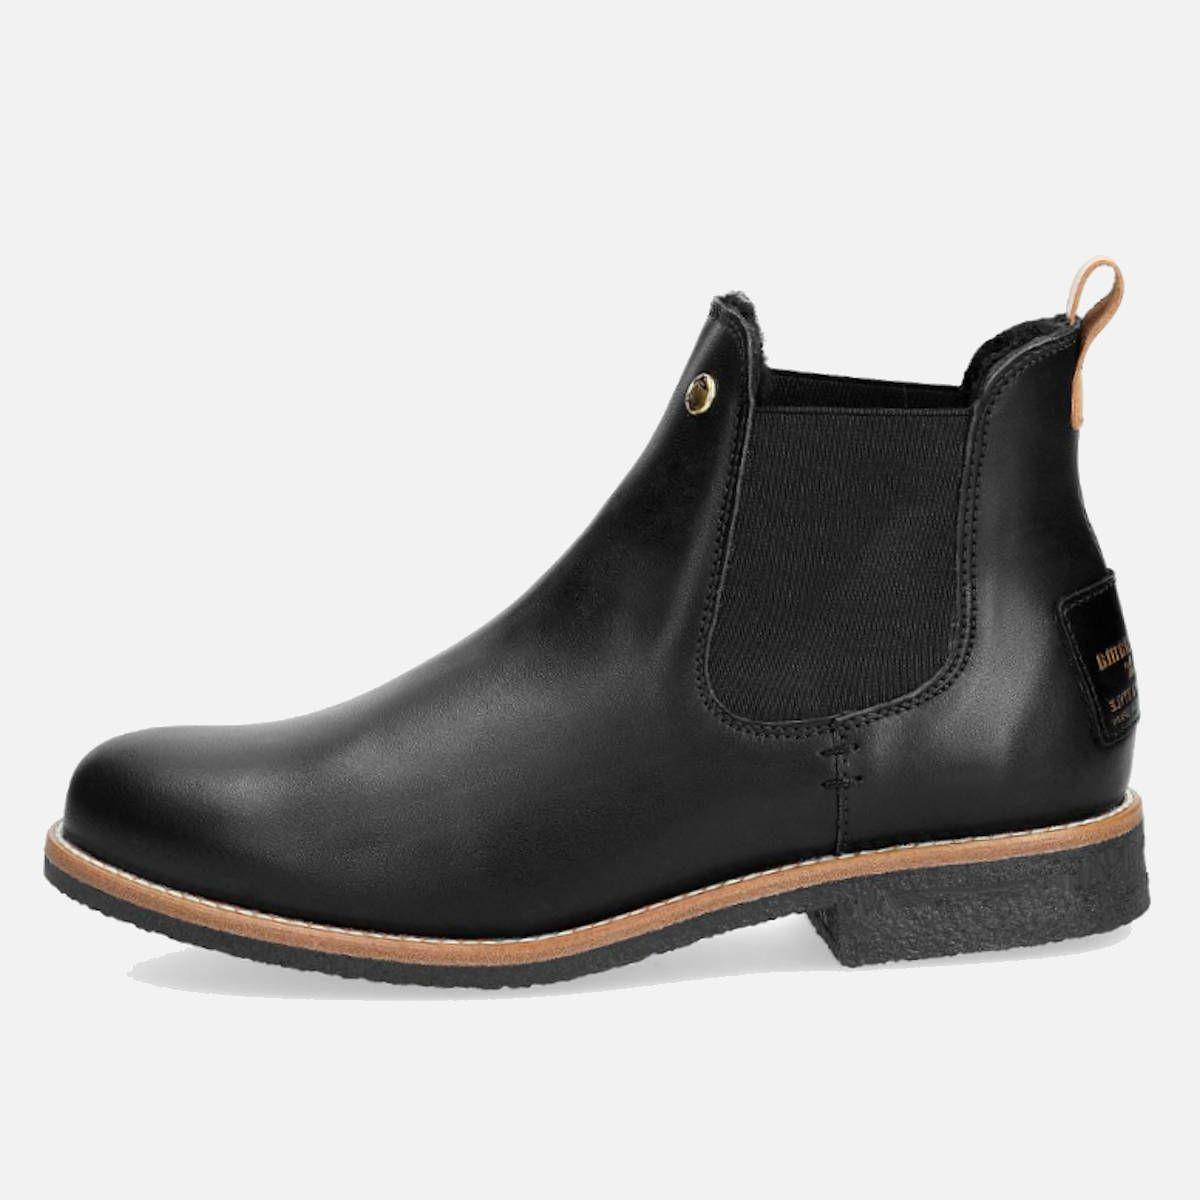 06fbe0fe3ed661 Panama Jack Black Giordana Fur Lined Slip On Boots